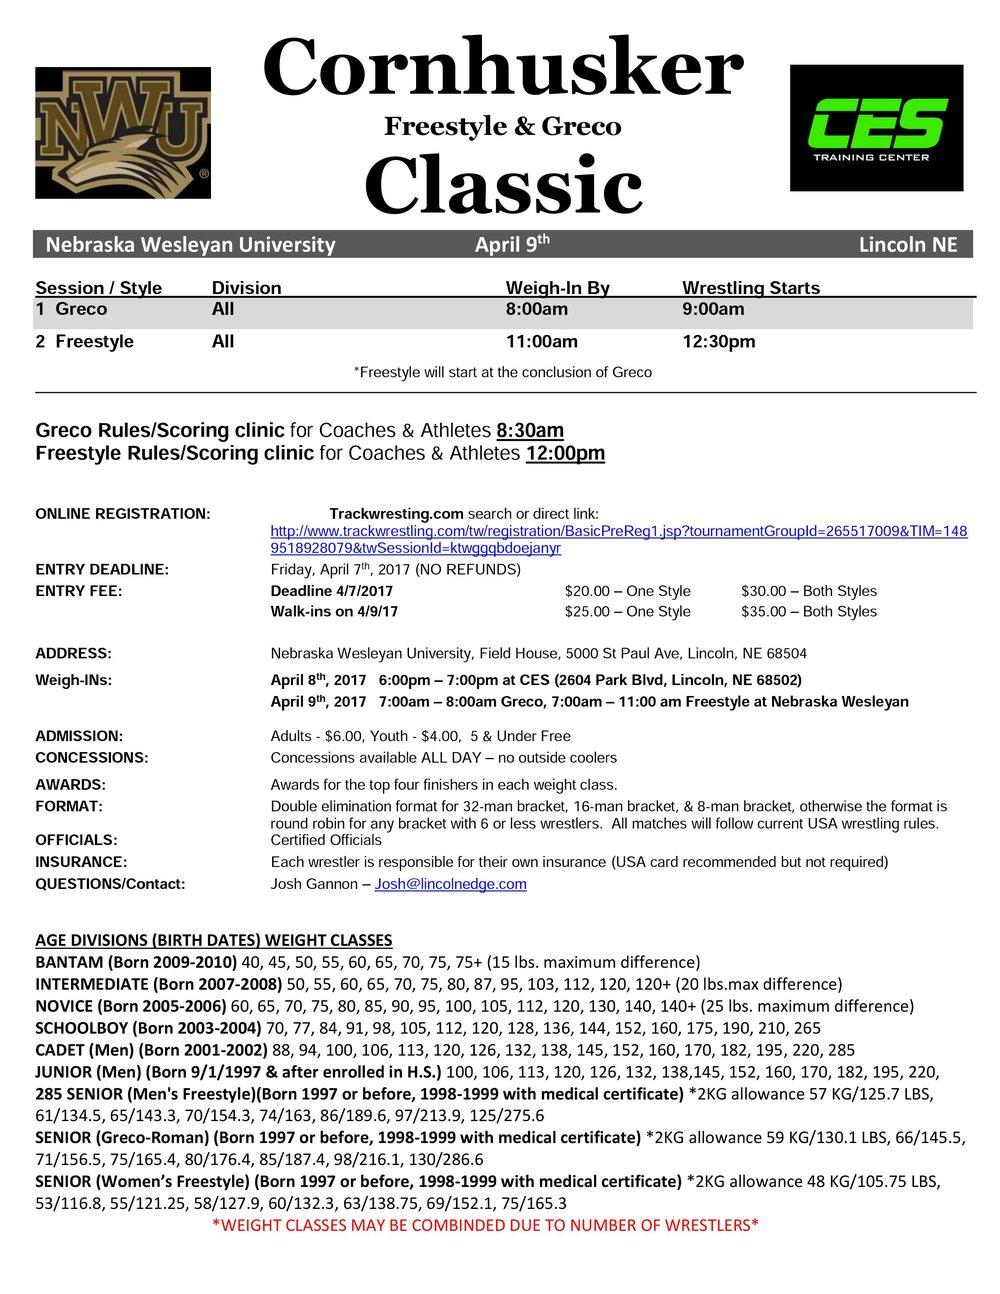 Info Flier - Cornhusker F&G Classic - 2017.jpg